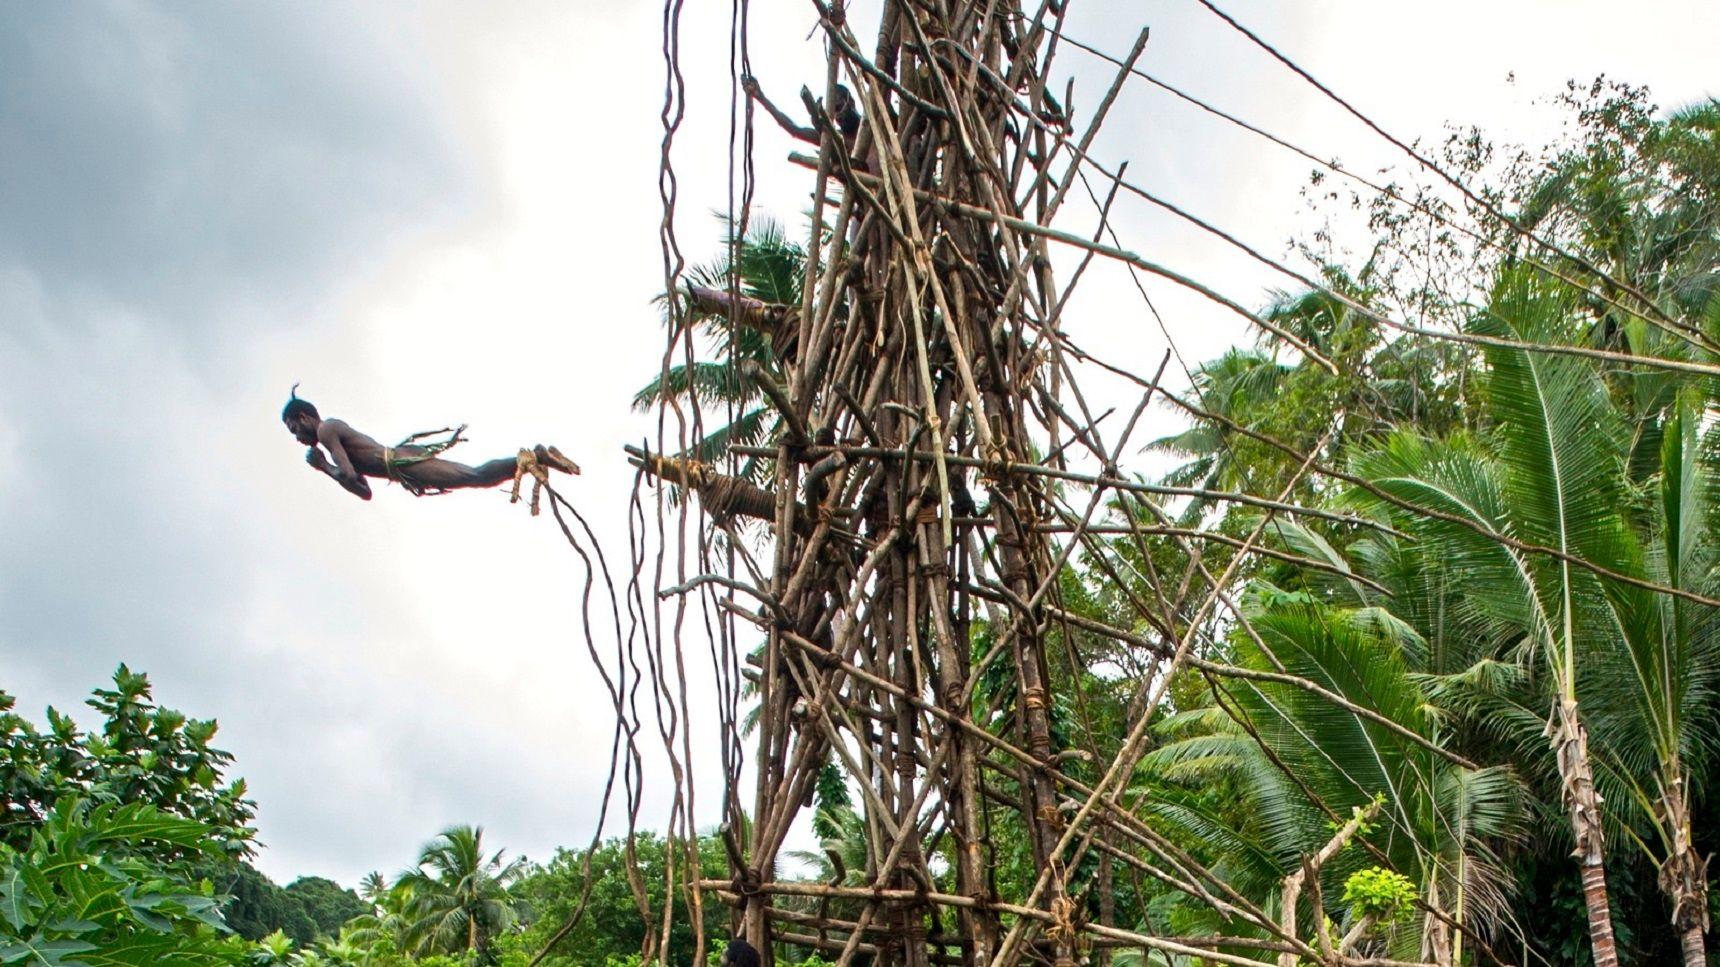 3. Vanuatu Land Diving